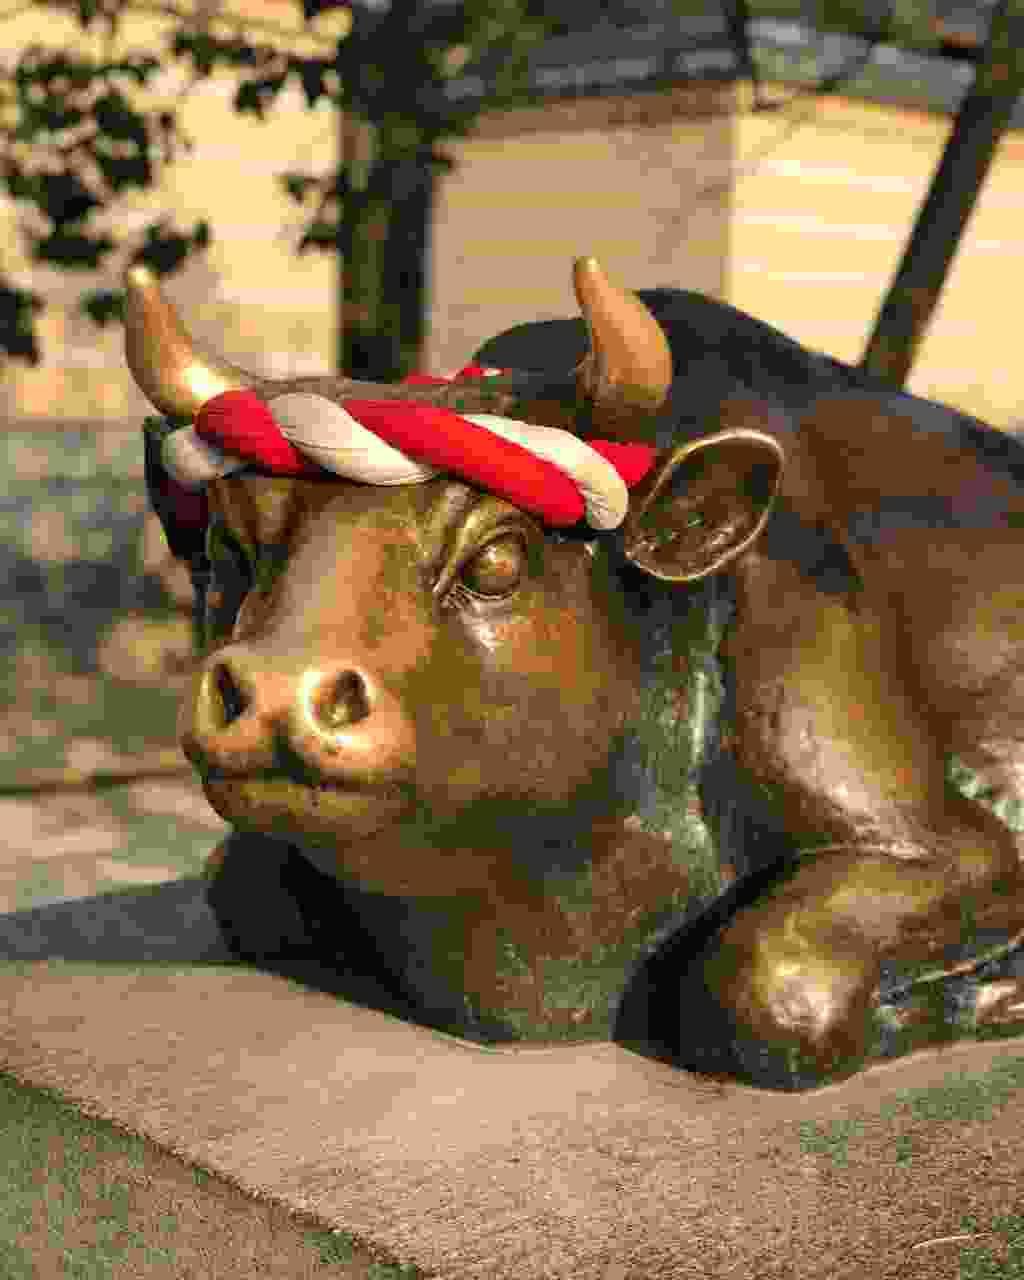 Rub the bull's head for luck in Dazaifu